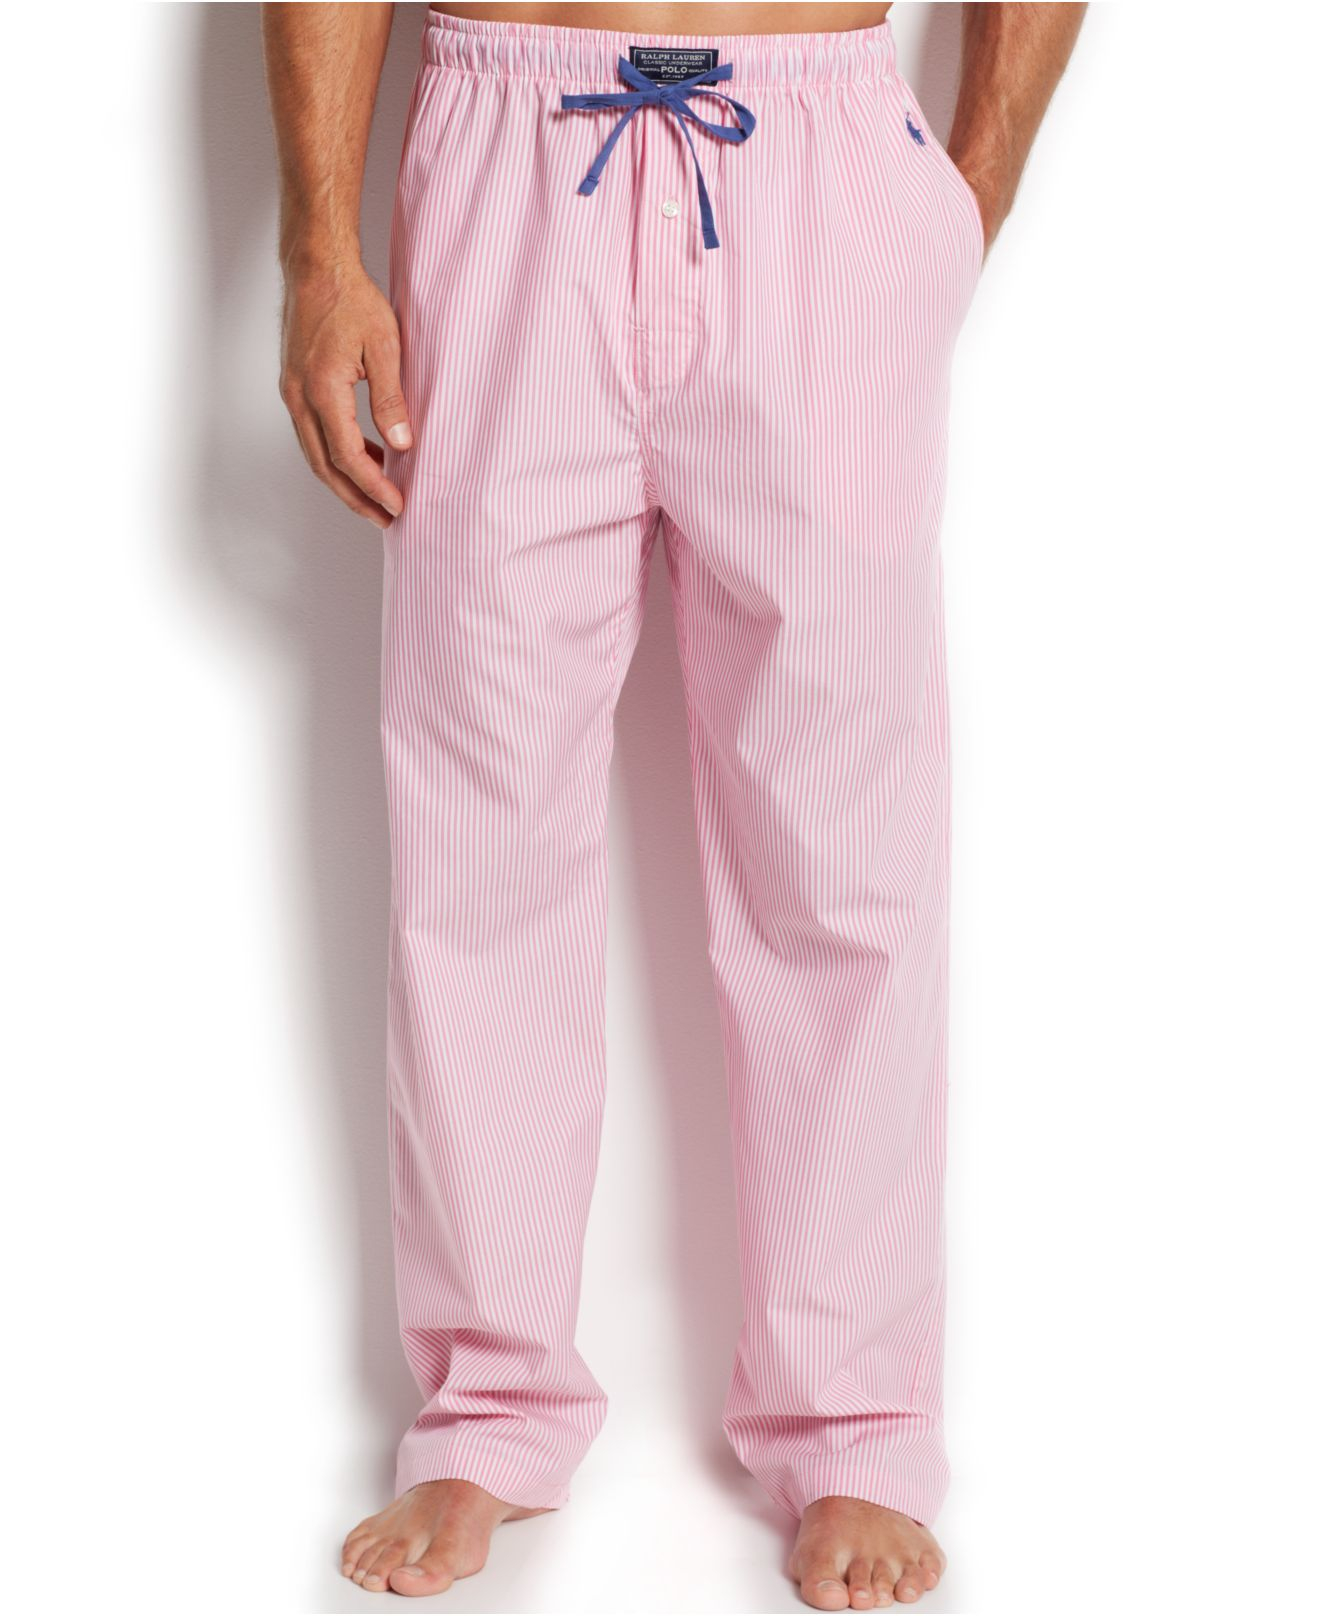 94c8a884854 Polo Ralph Lauren Mens Knit Oxford Pajama Pants - Capital Facility ...